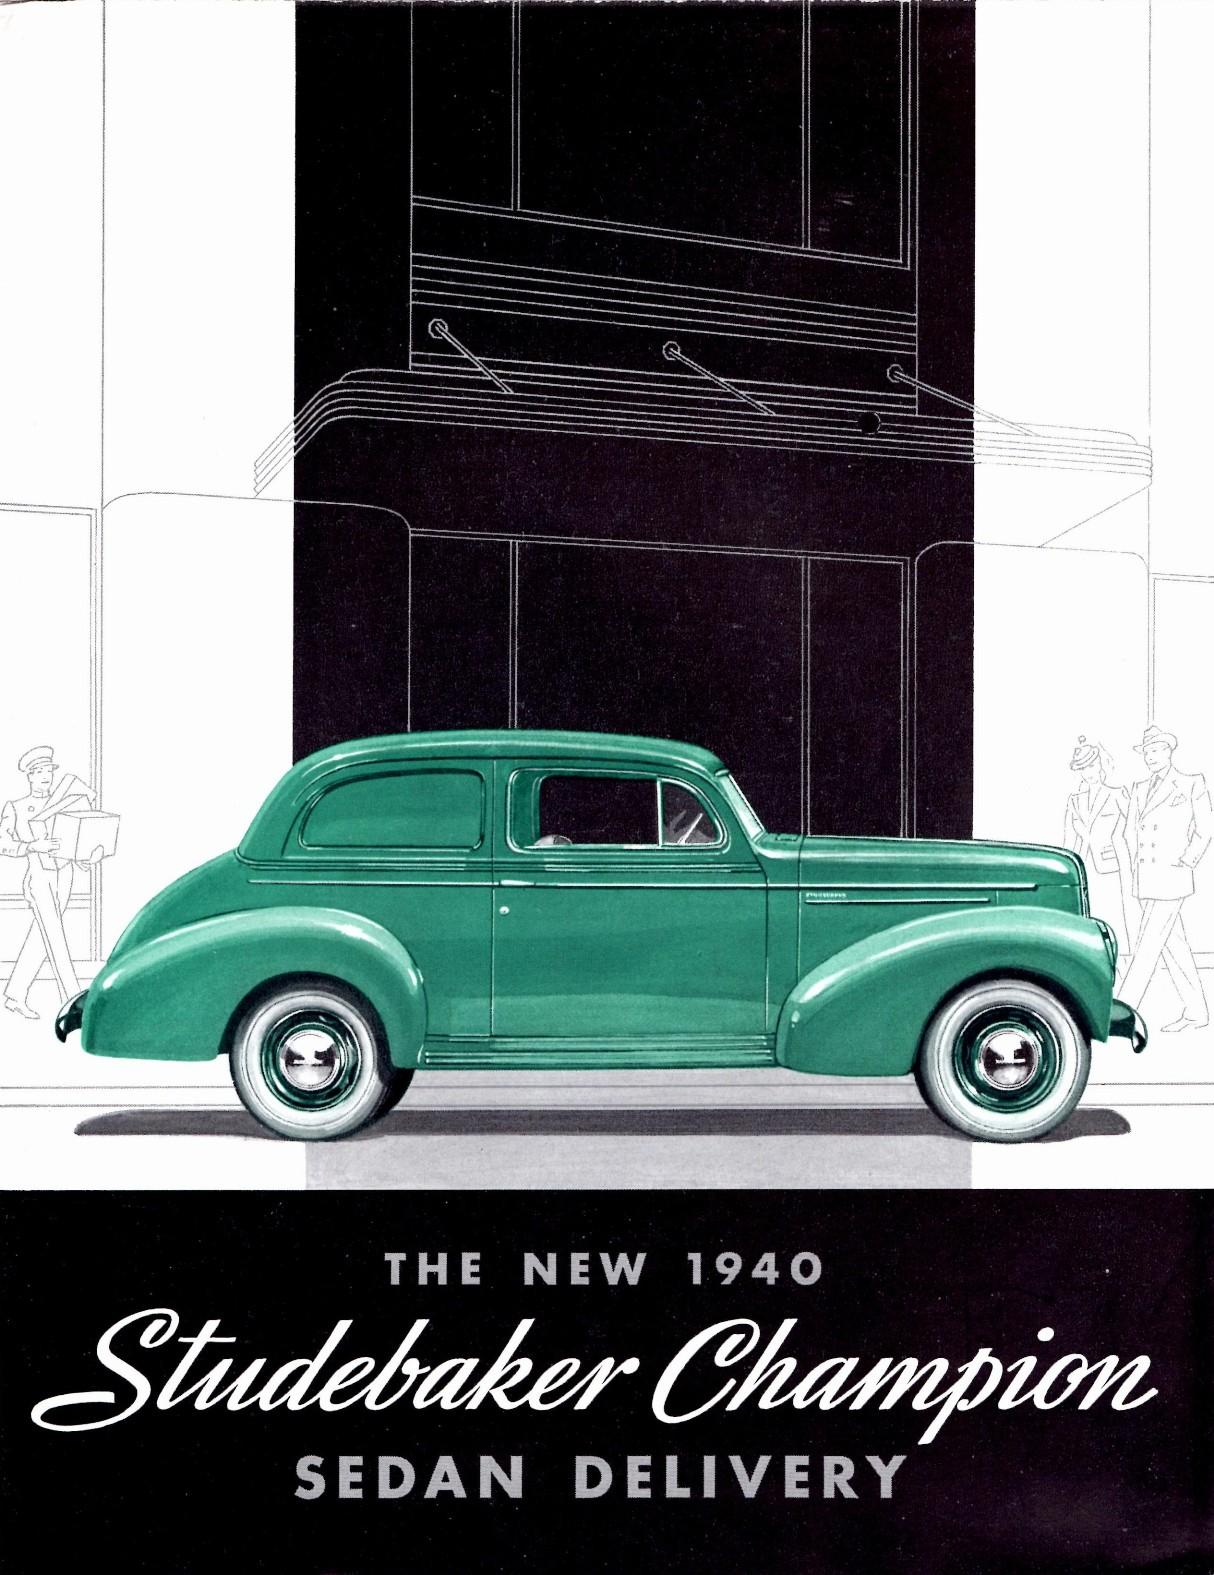 1940 Studebaker Champion Sedan Delivery | Alden Jewell | Flickr